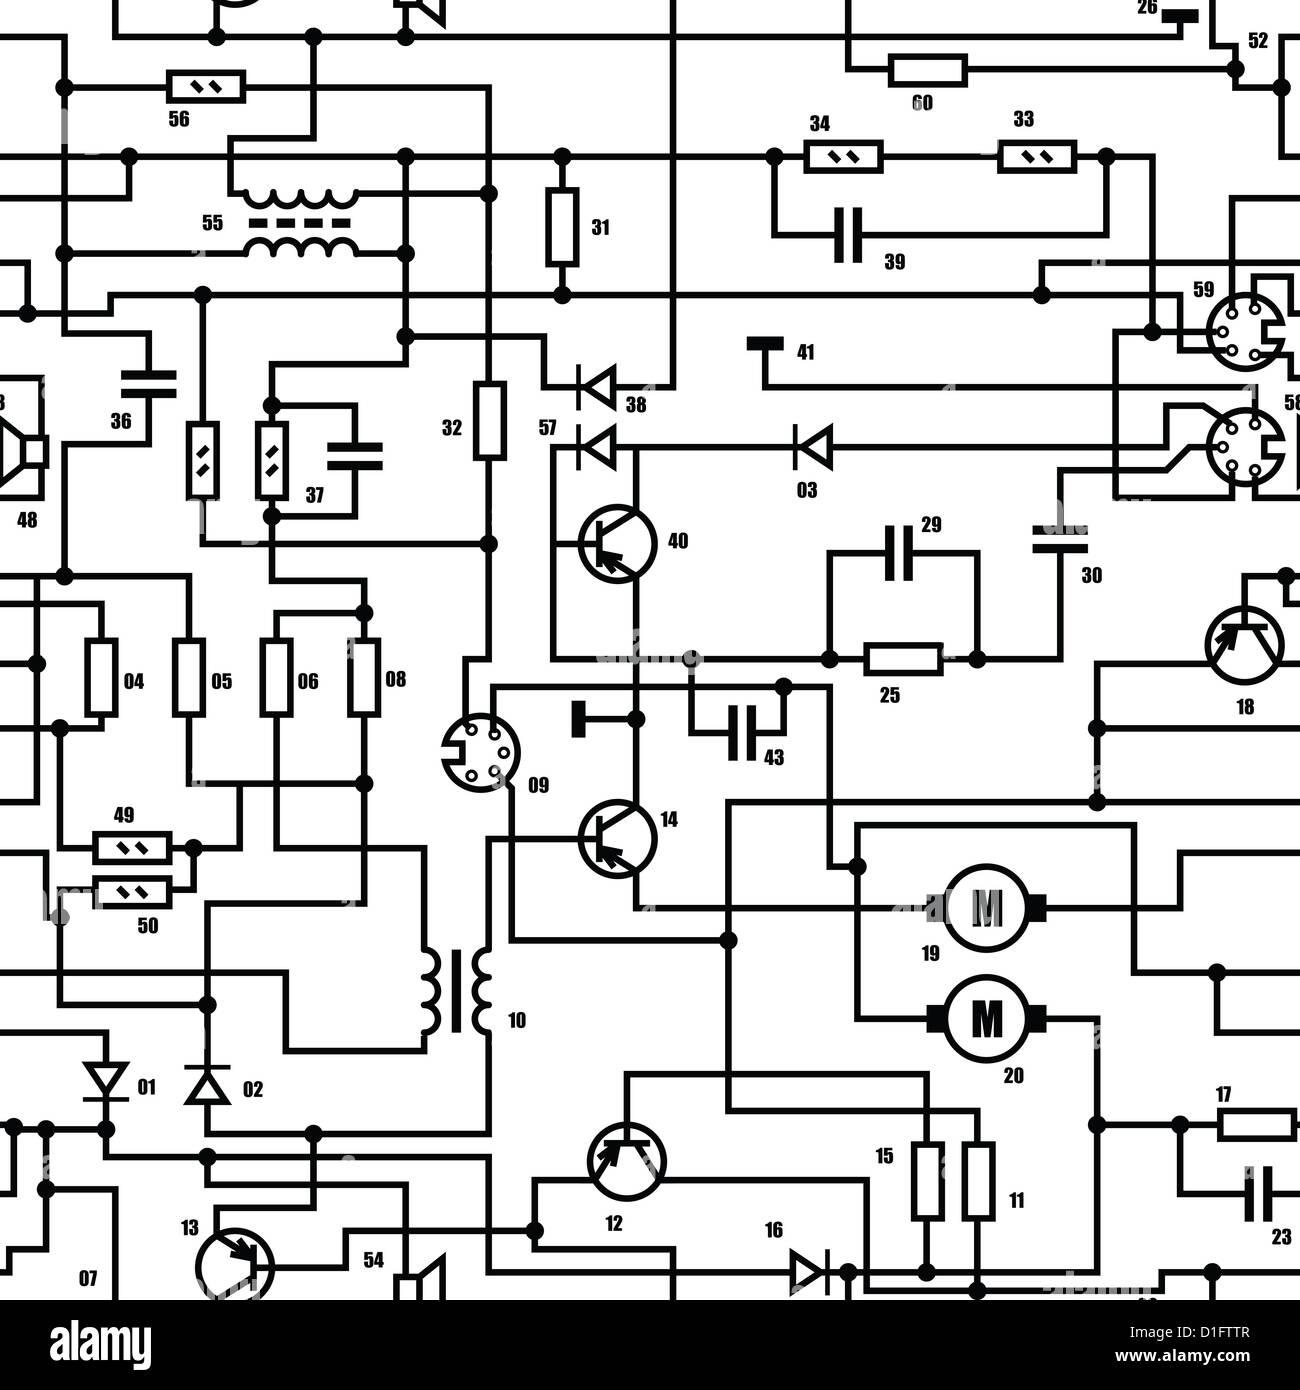 Wunderbar Technische Diagramme Fotos - Verdrahtungsideen - korsmi.info